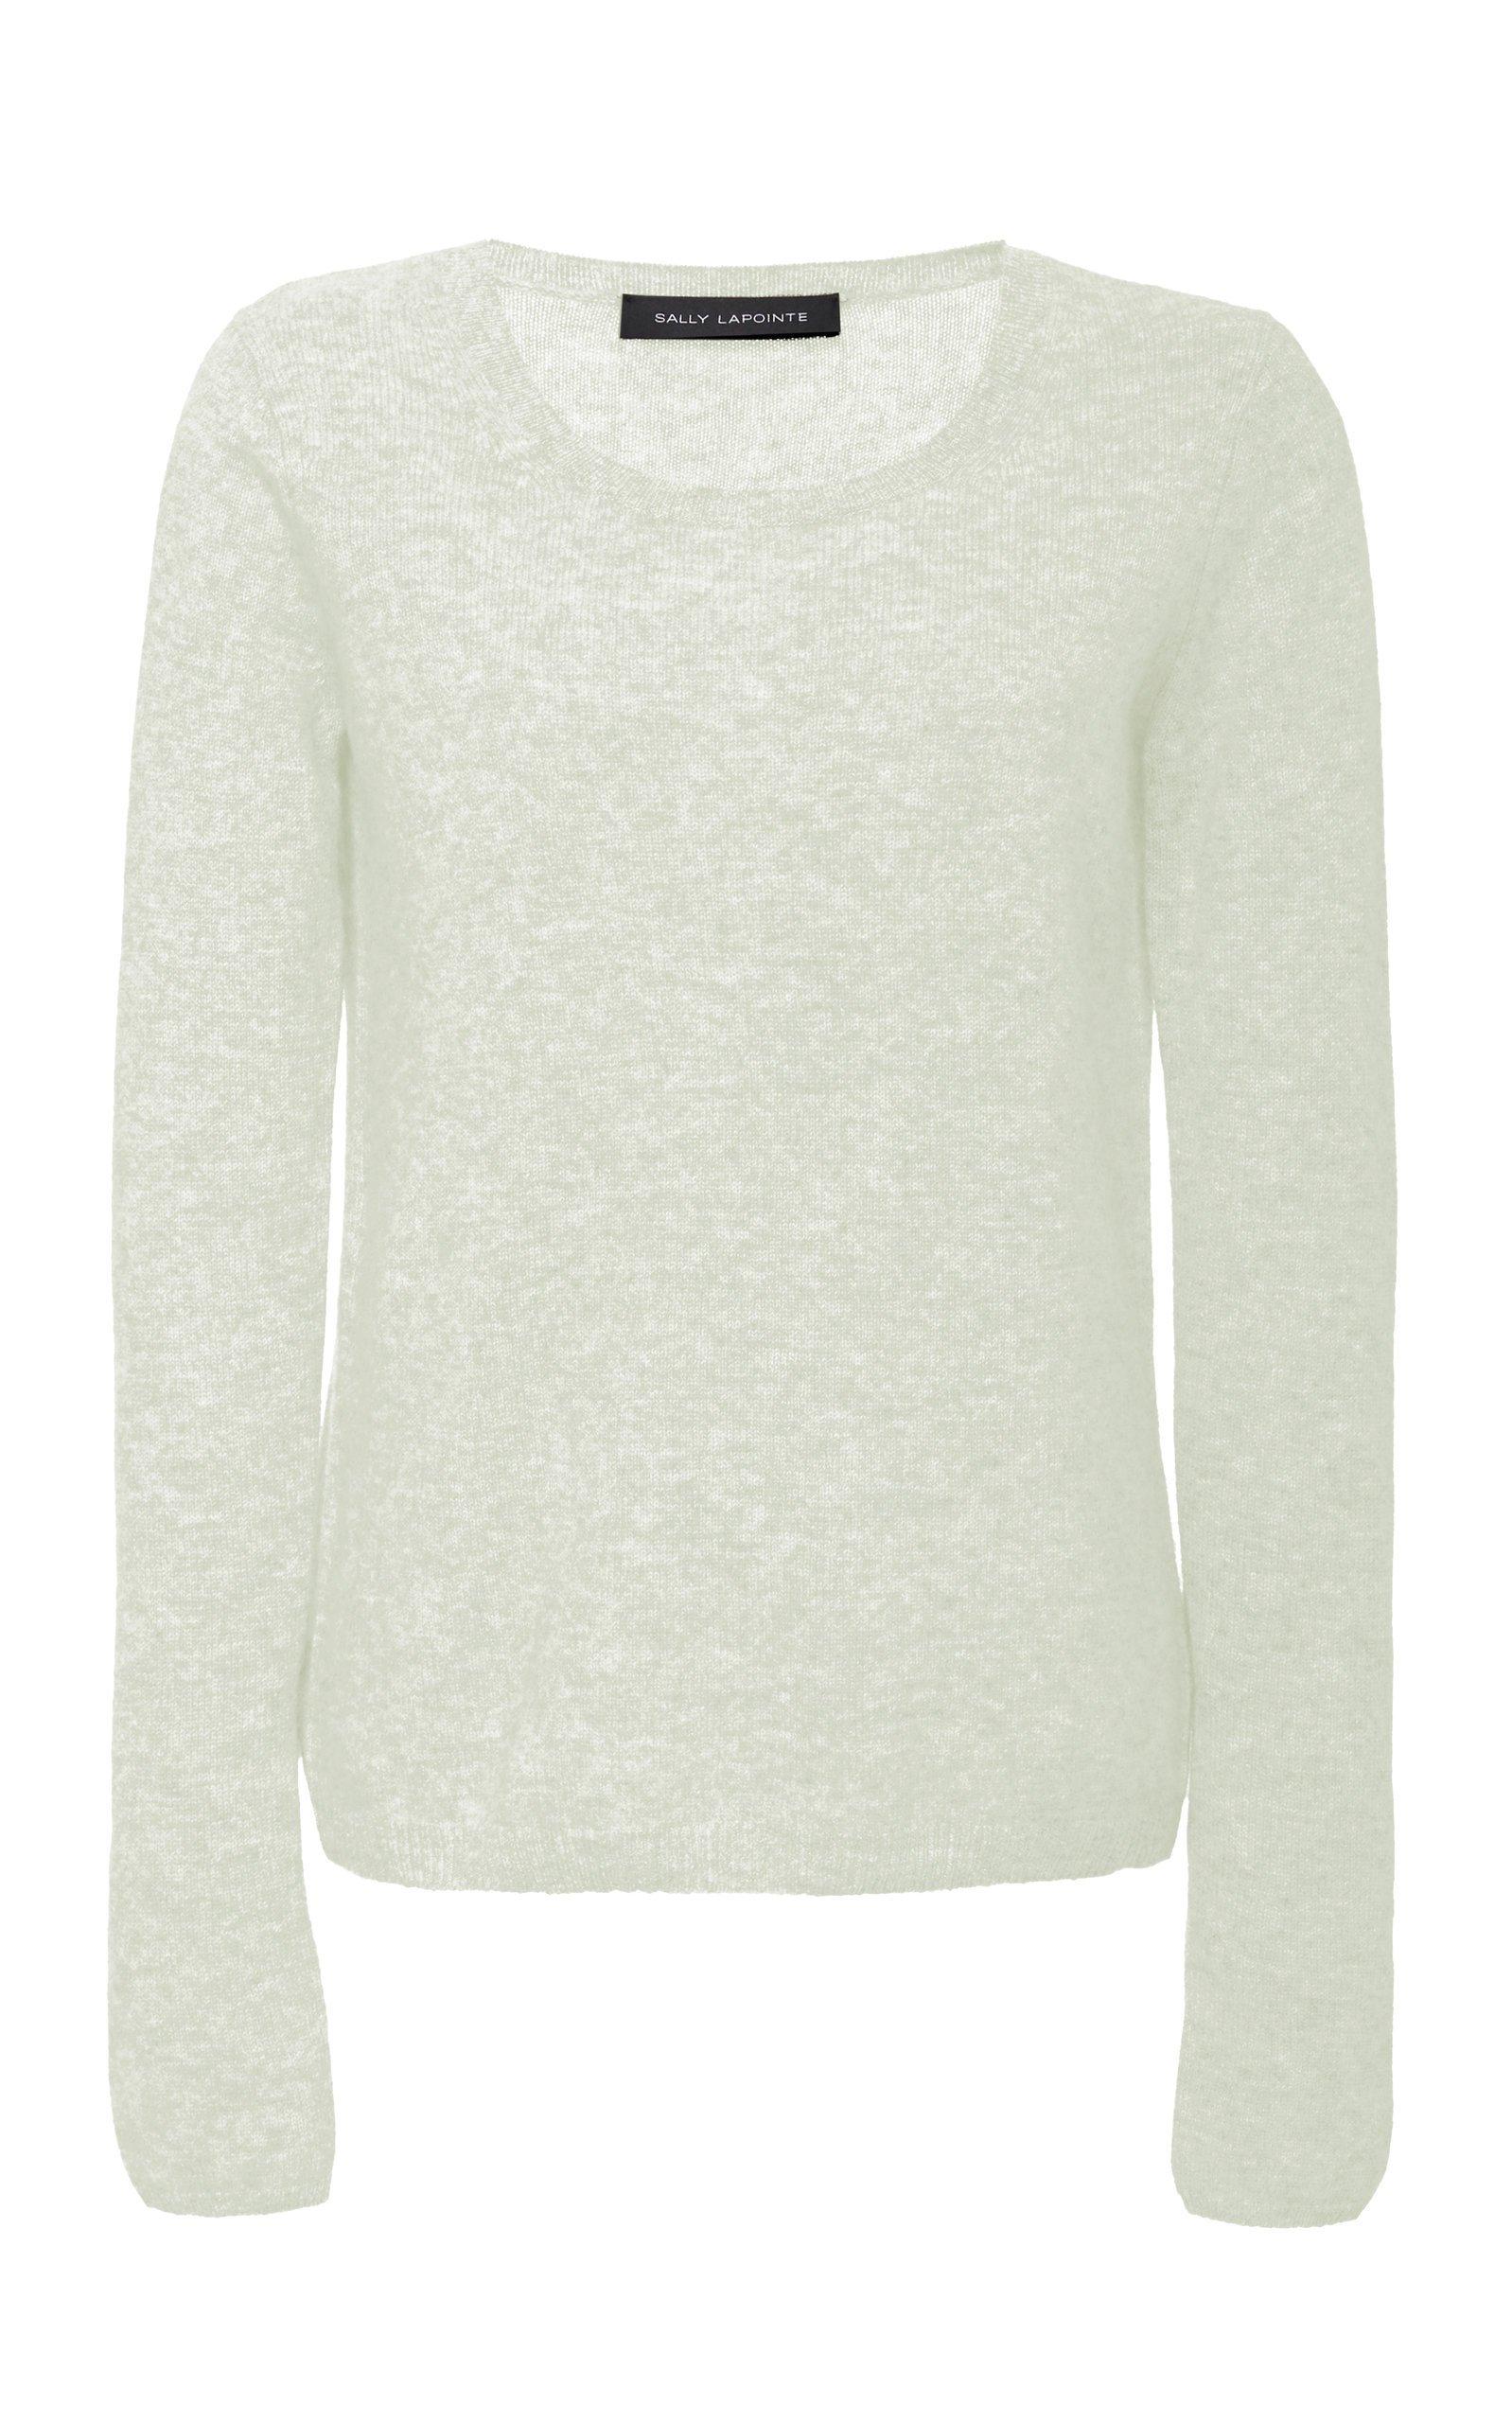 Sally LaPointe Cashmere Longsleeve Crewneck Sweater Size: S